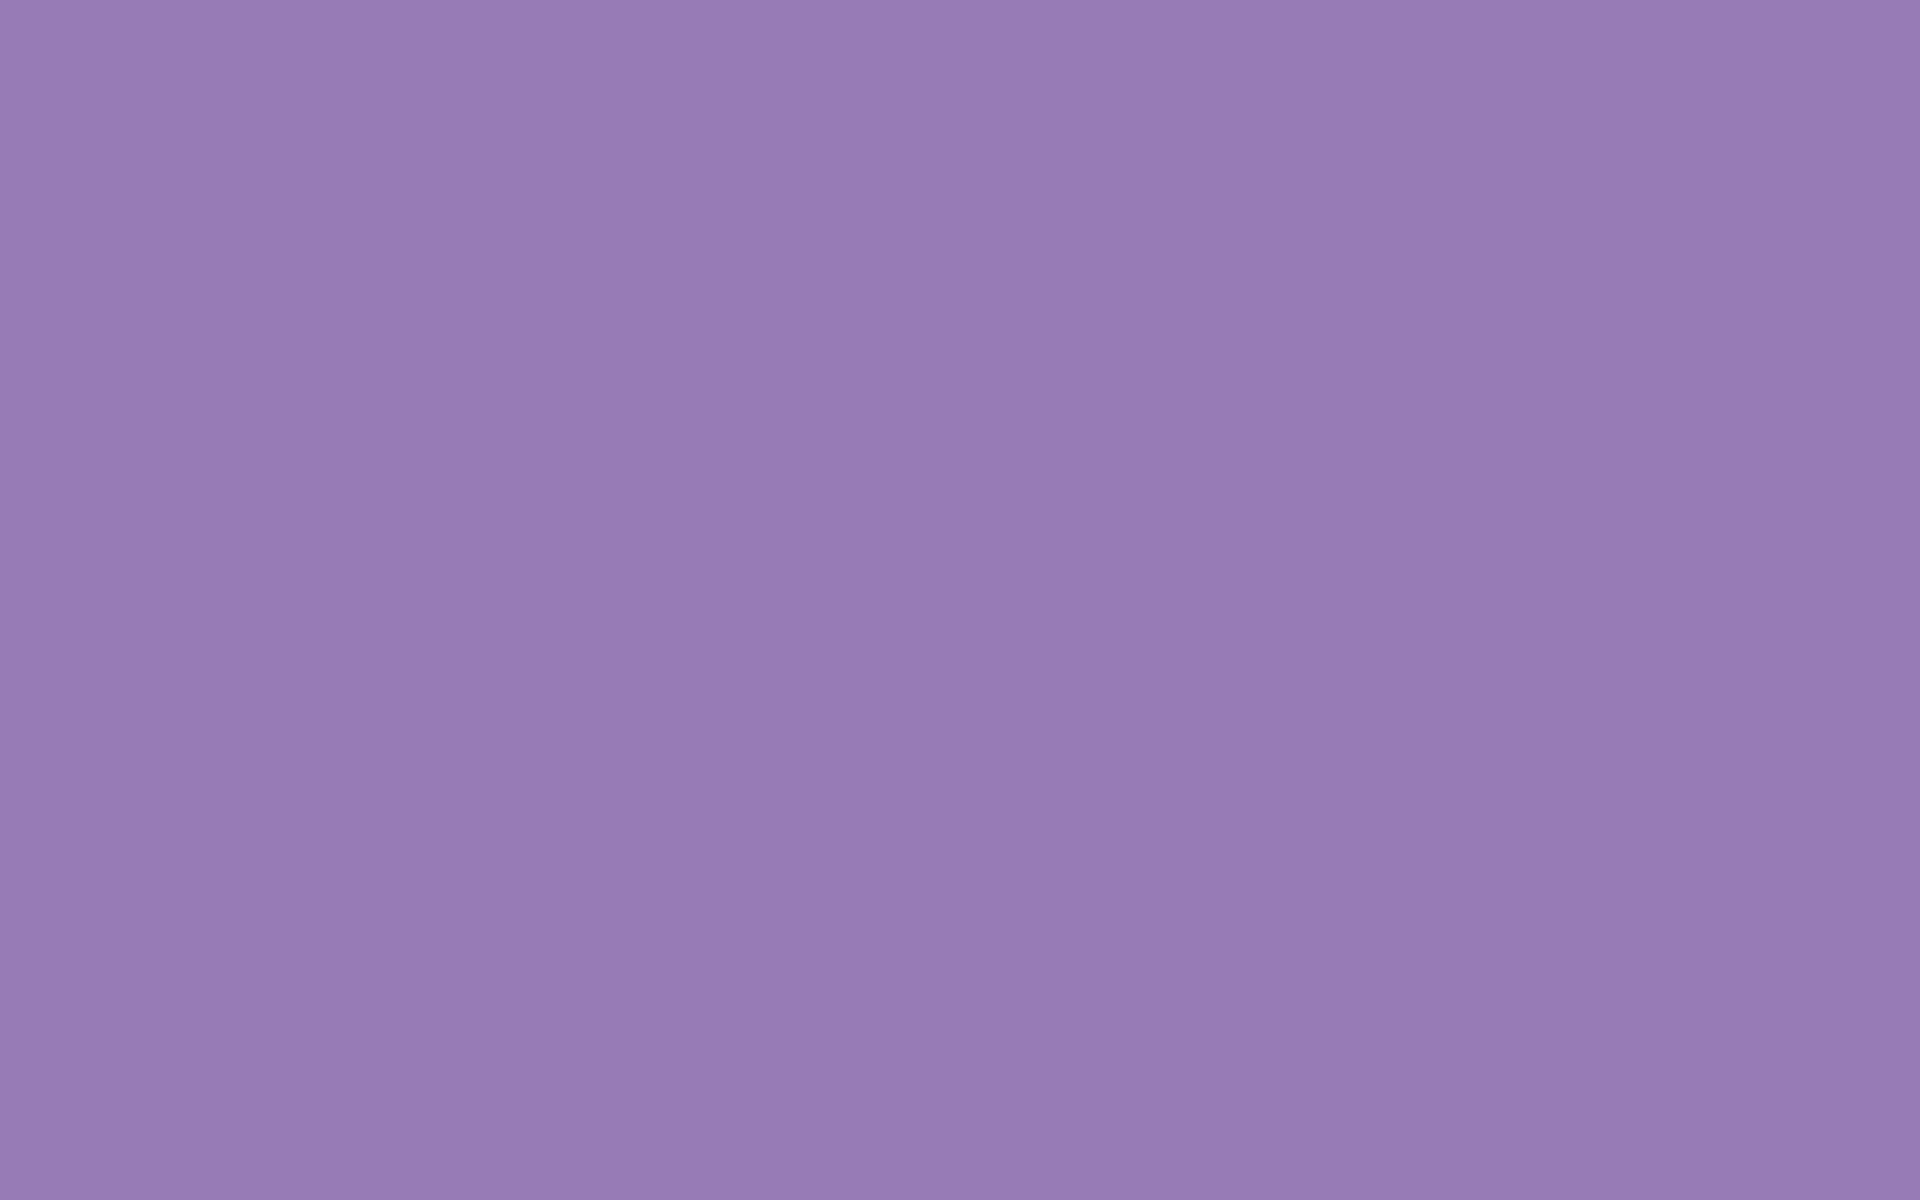 1920x1200 Lavender Purple Solid Color Background